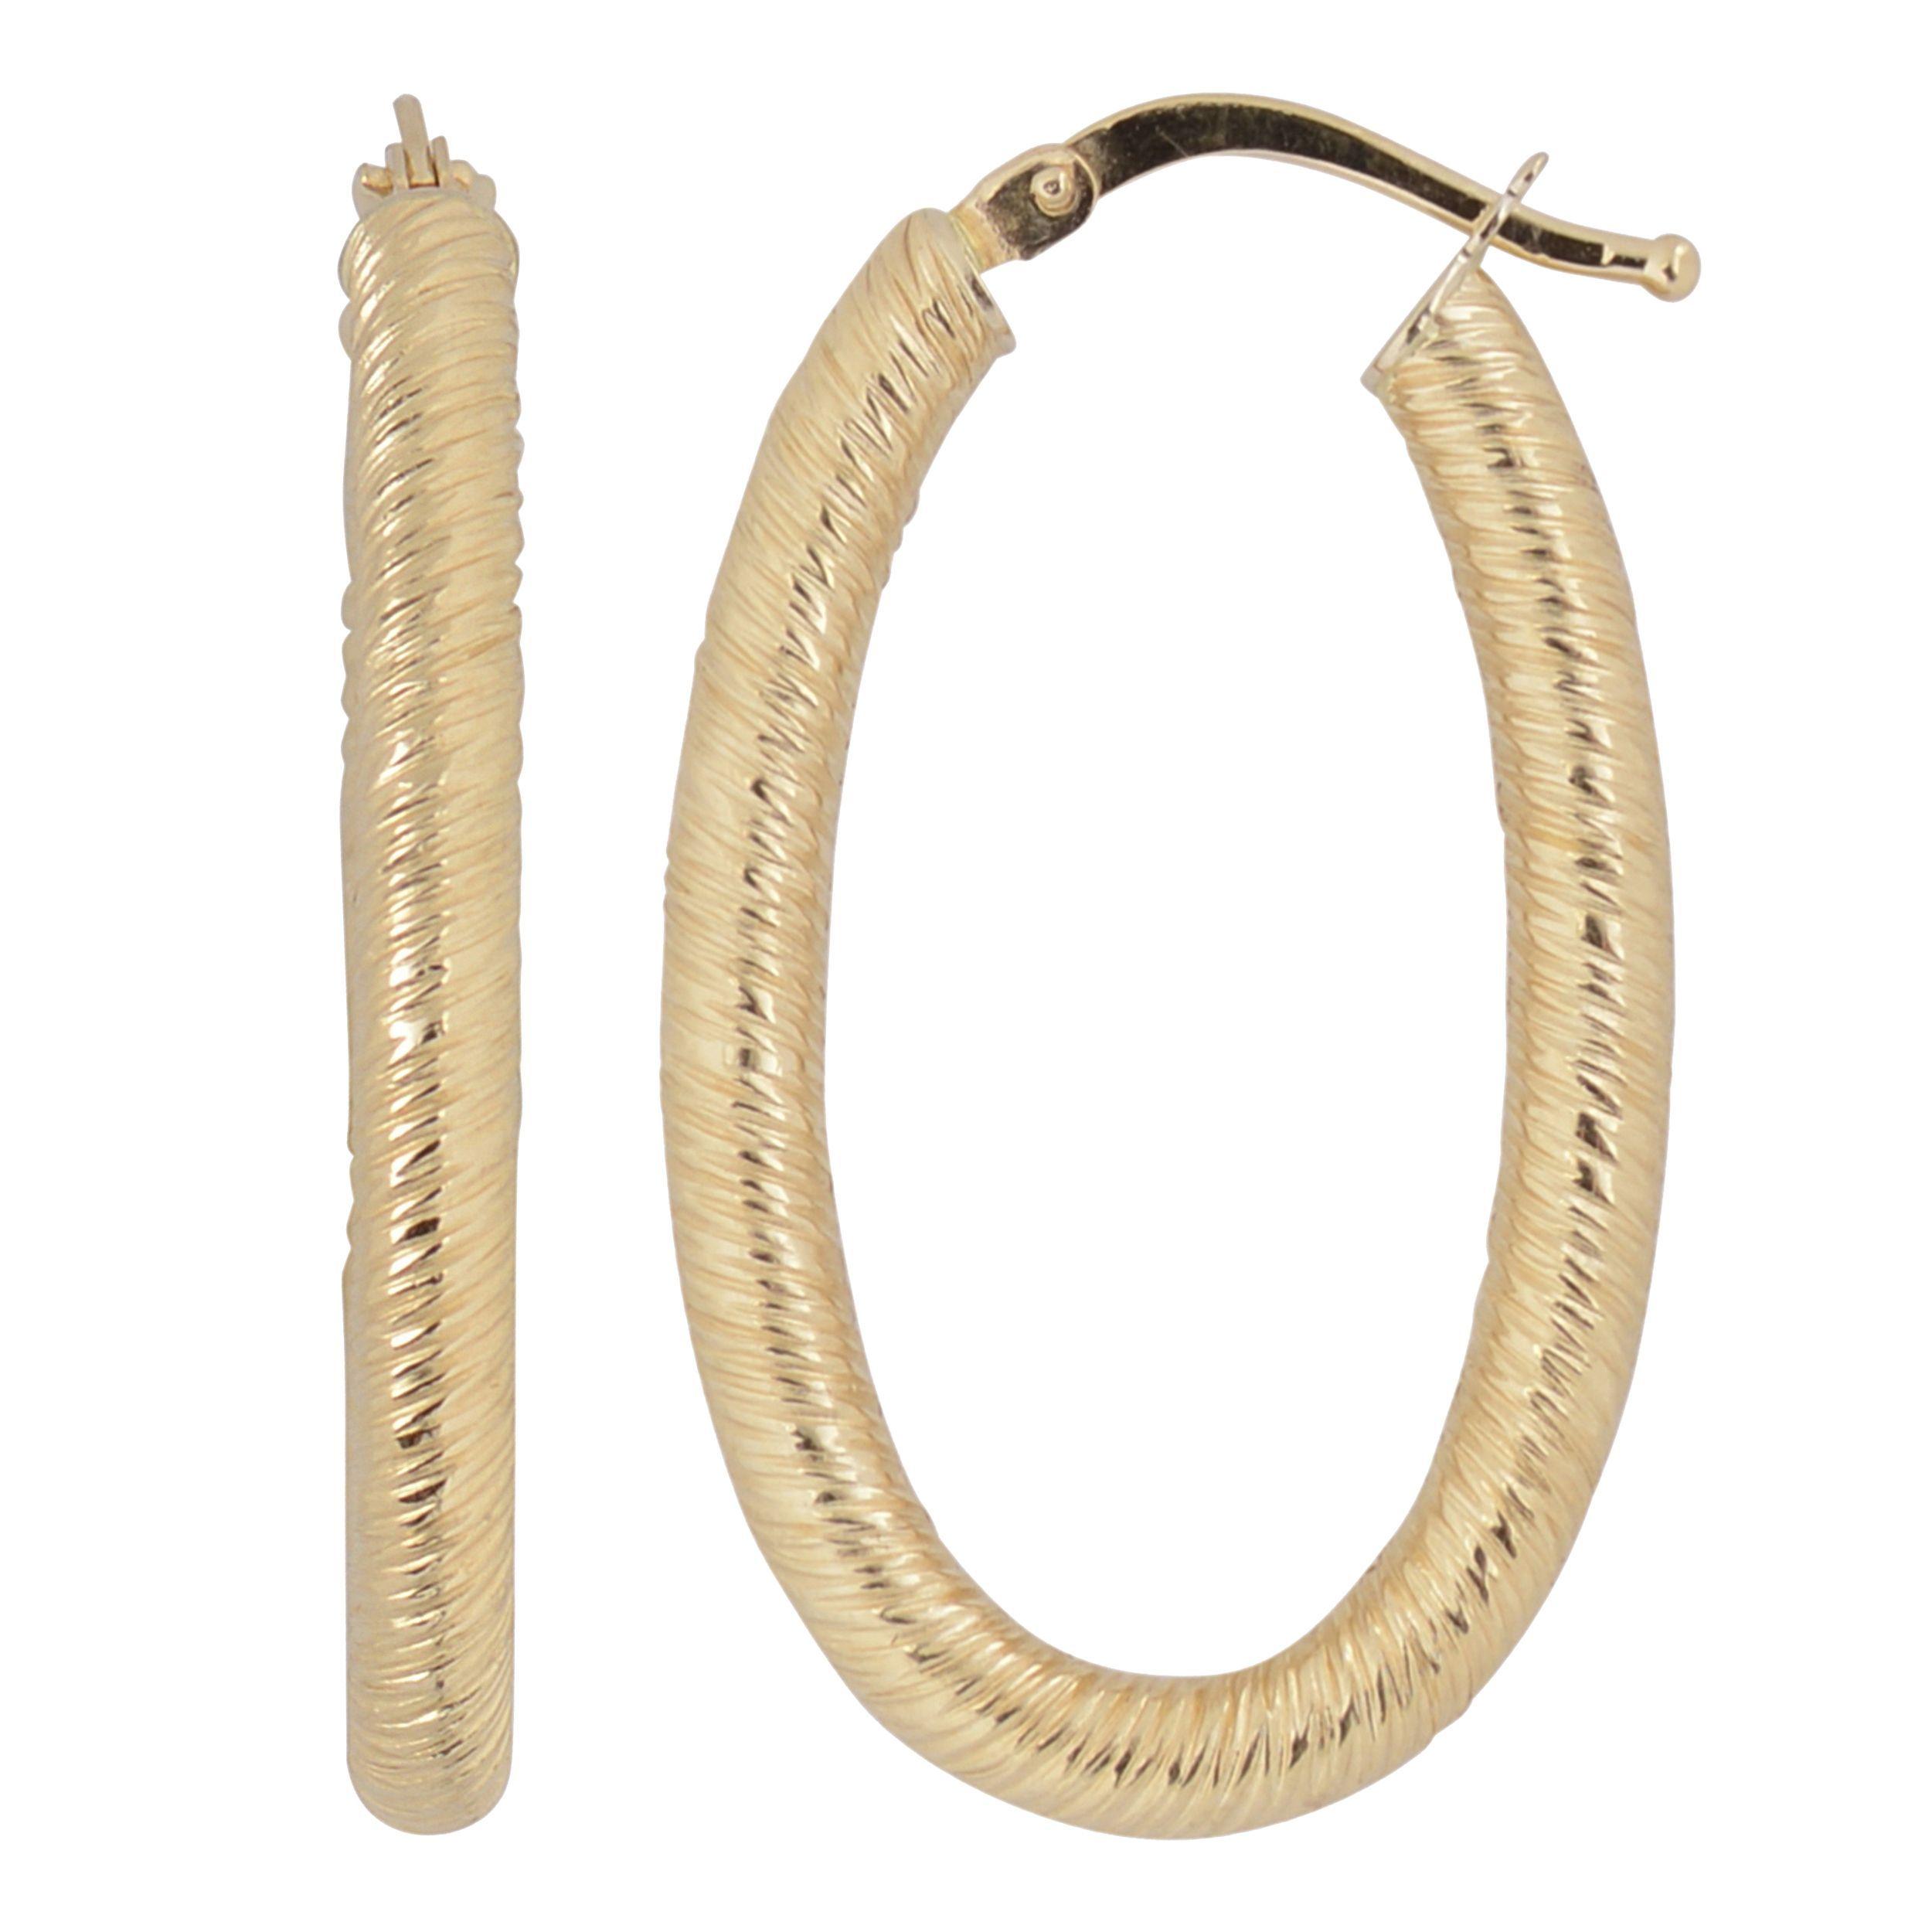 Fremada Italian 14k Yellow Gold Oval Hoop Earrings (yellow gold), Women's, Size: Medium